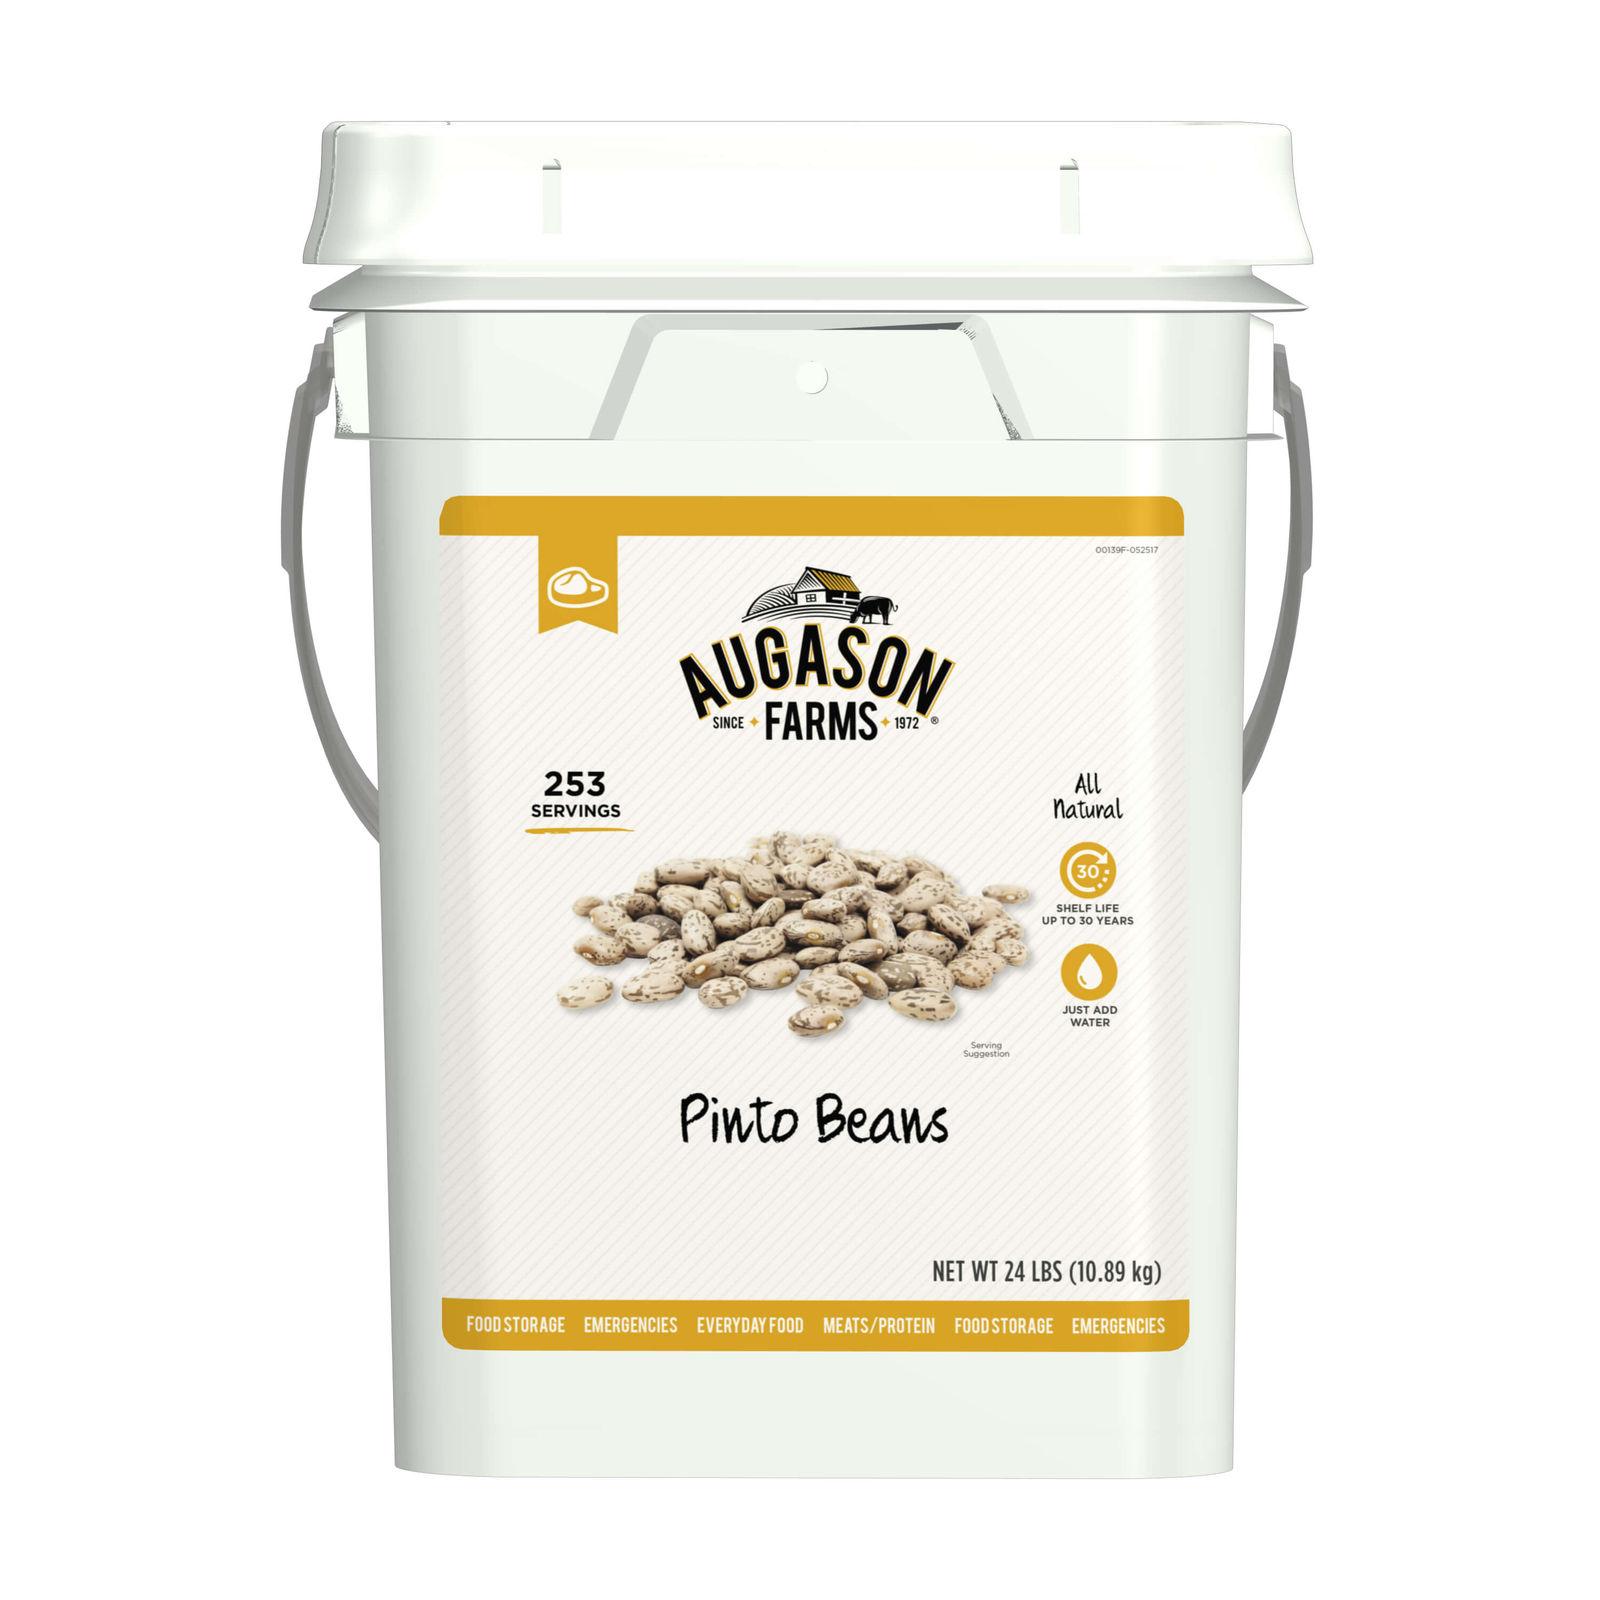 Augason Farms Pinto Beans Emergency Bulk Food Storage 24 Pound 4-Gallon Pail 253 1